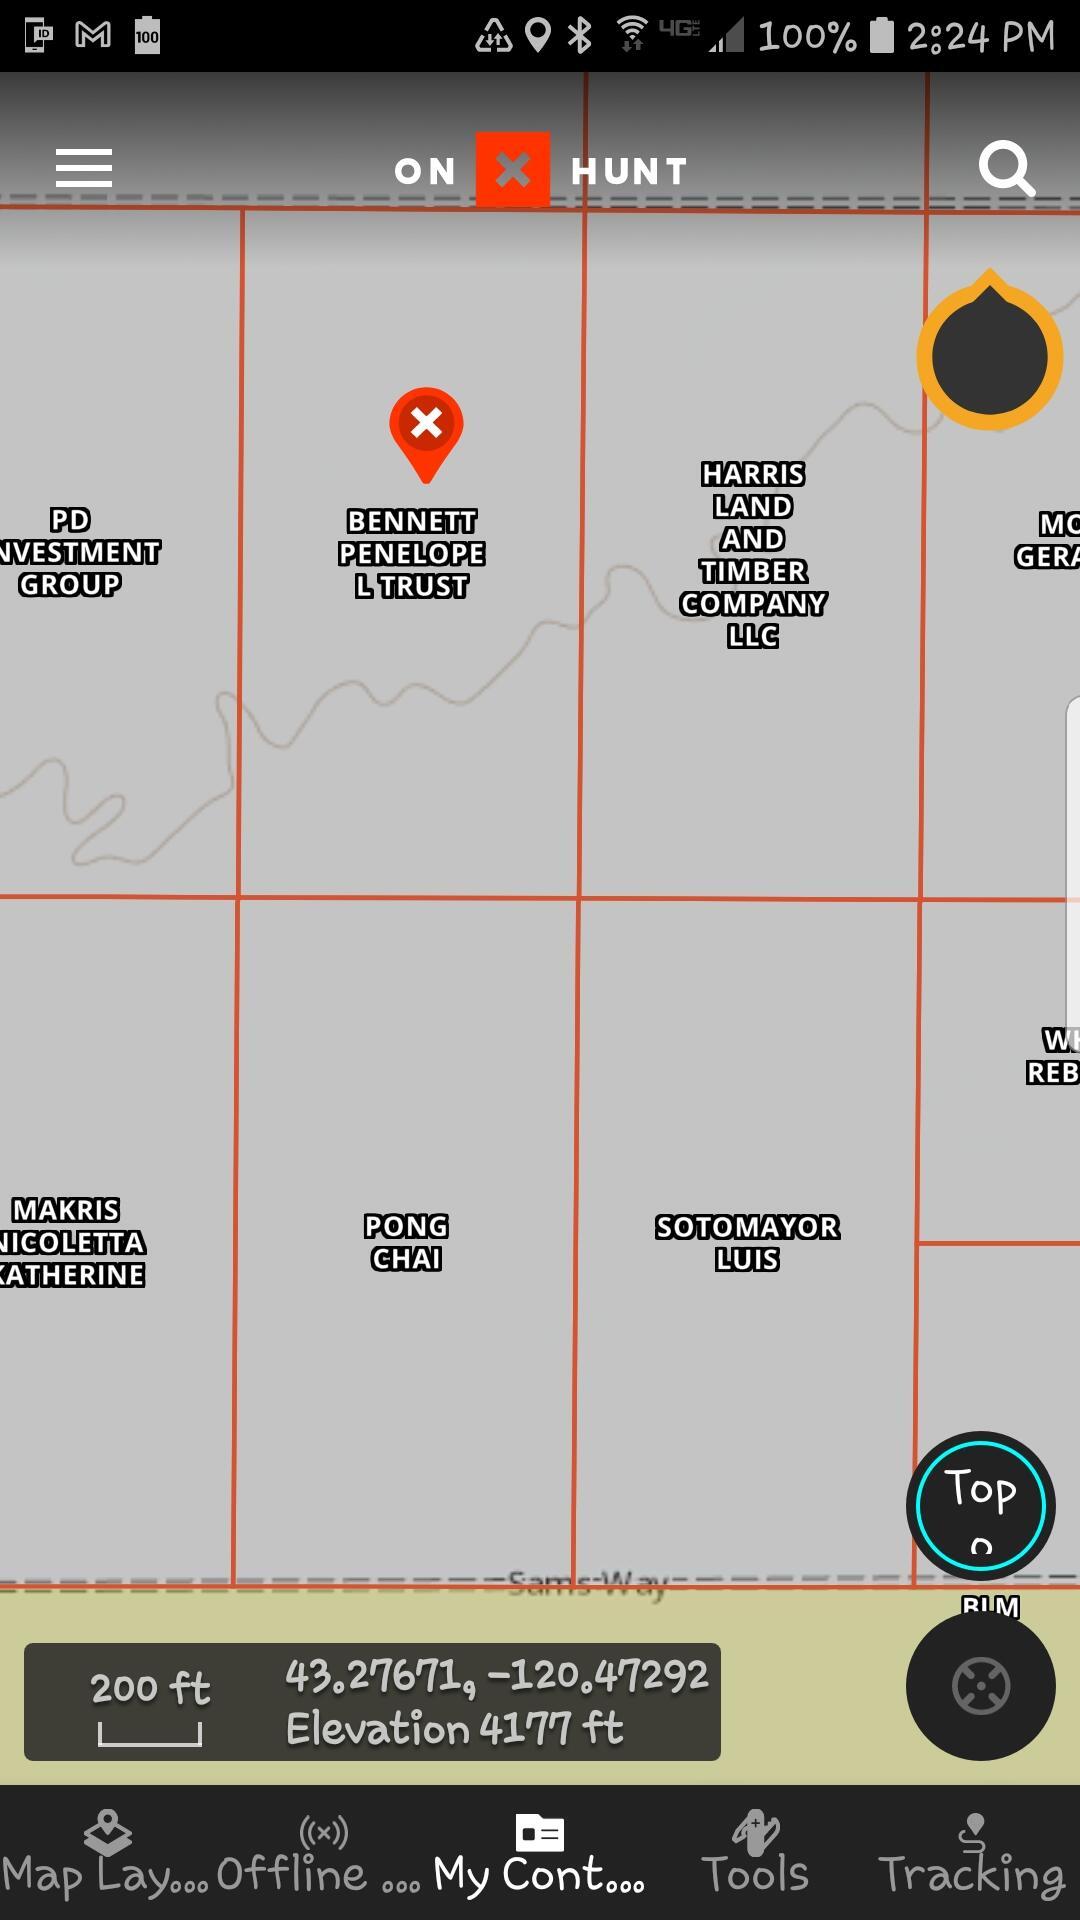 Property location on On X Hunt app